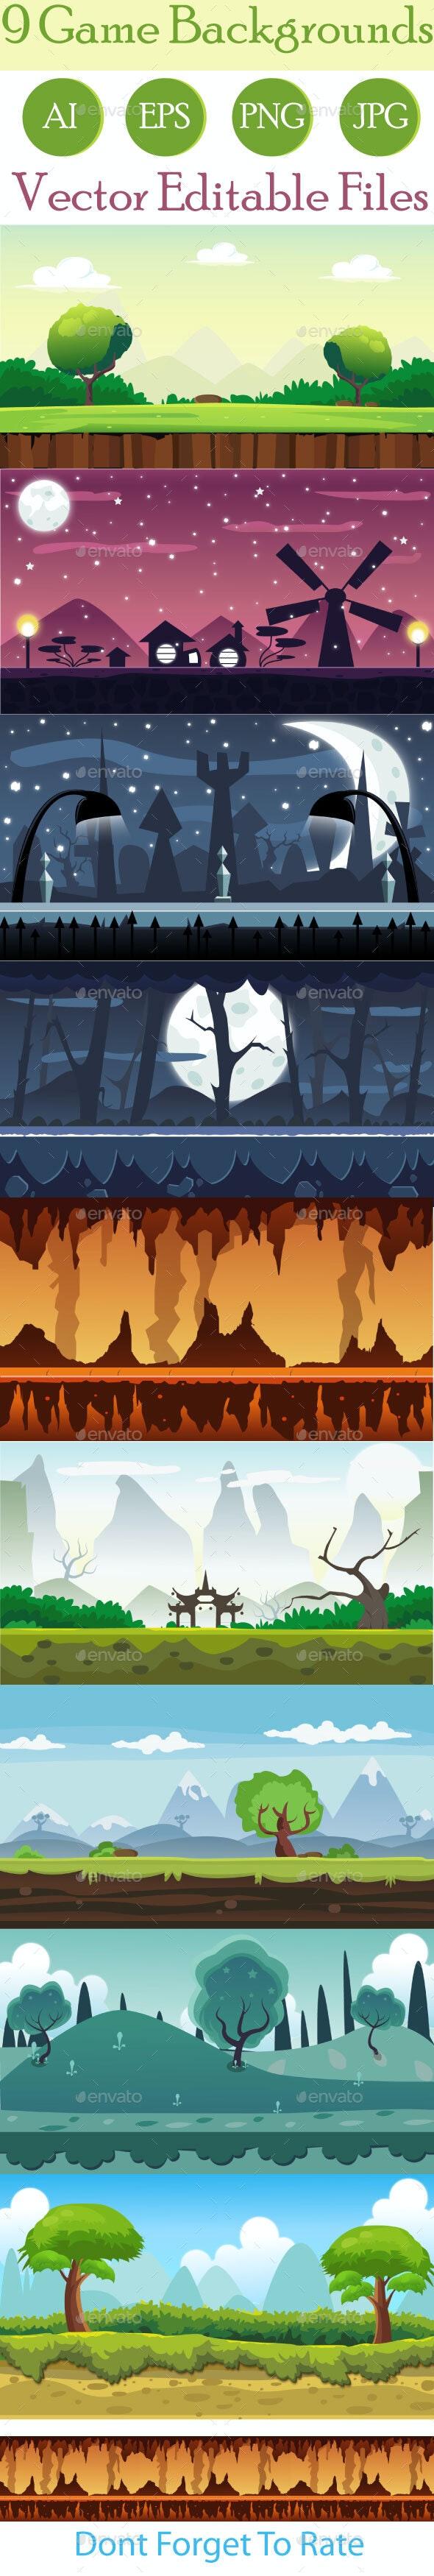 9 Game Background Set - Backgrounds Game Assets